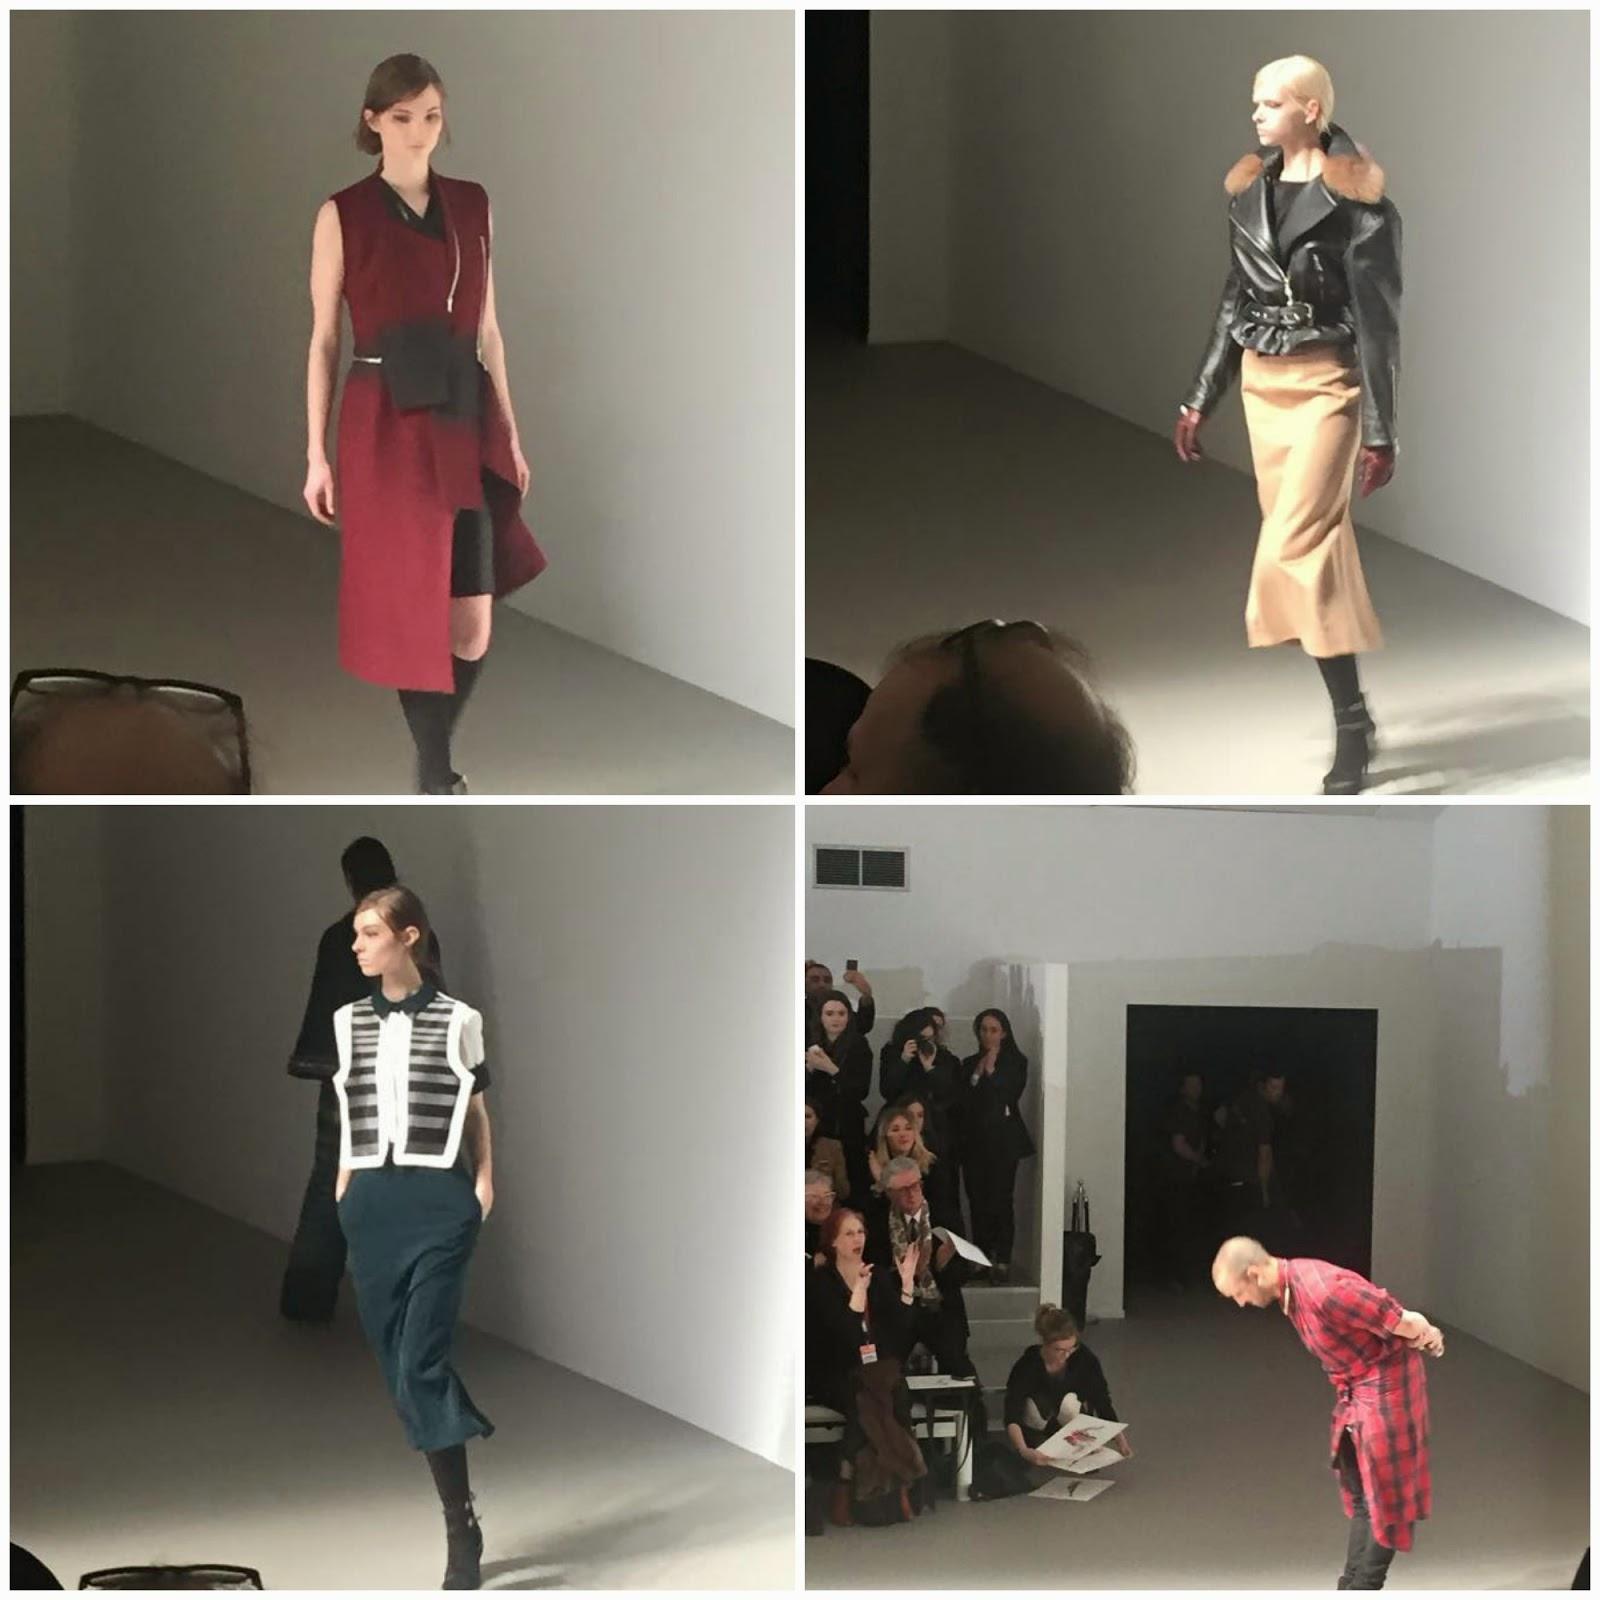 LFW AW15 Snapshots: Photo Diary, mode madeleine, fashion blogger, LFW, AW15, london fashion week, seventies, styling, catwalk, fashion week, felder felder, bora aksu, red hot sunglasses, sam faires, michelle keegan, rosie londoner, jean pierre braganza